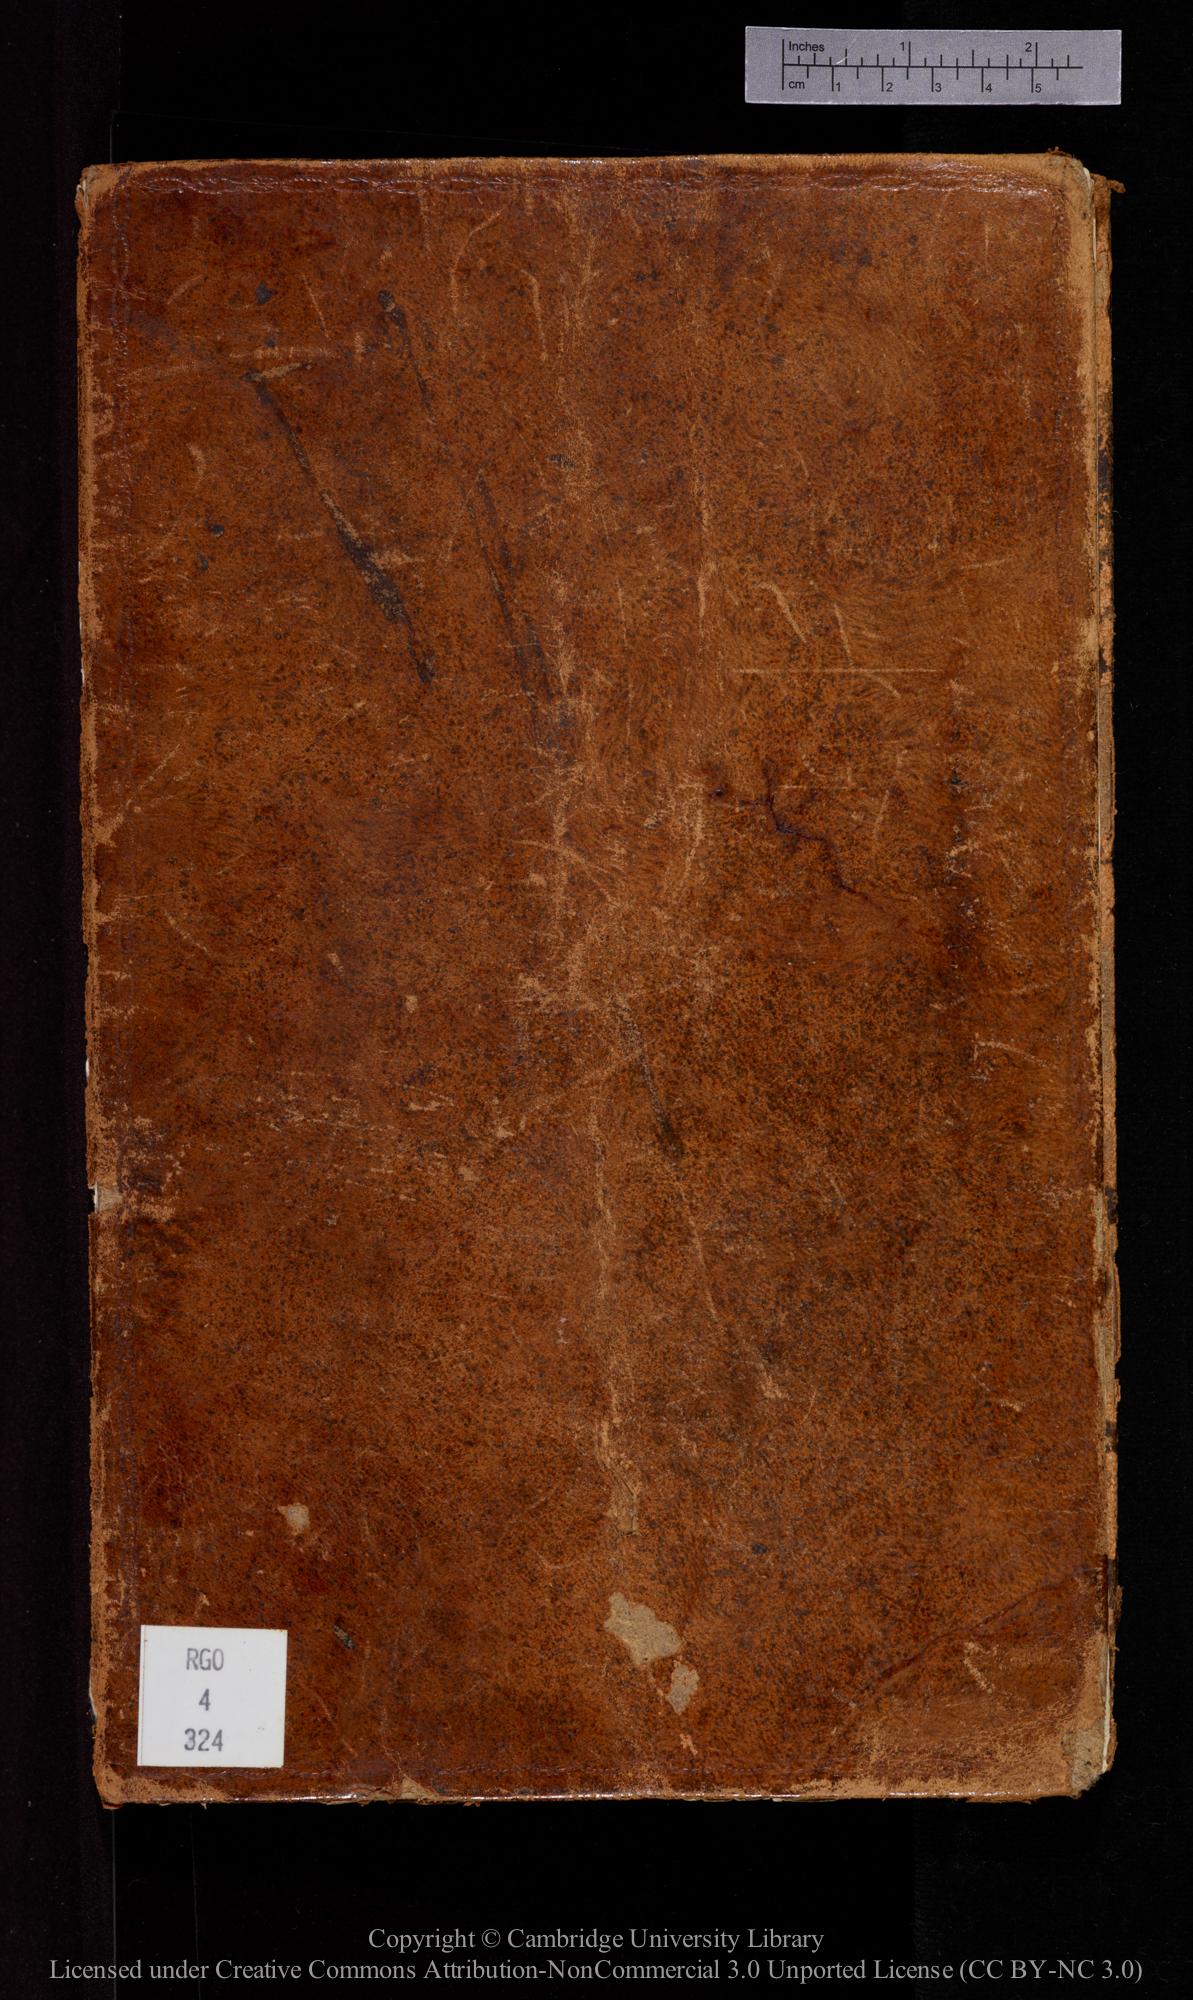 Diary of 'Nautical Almanac' work